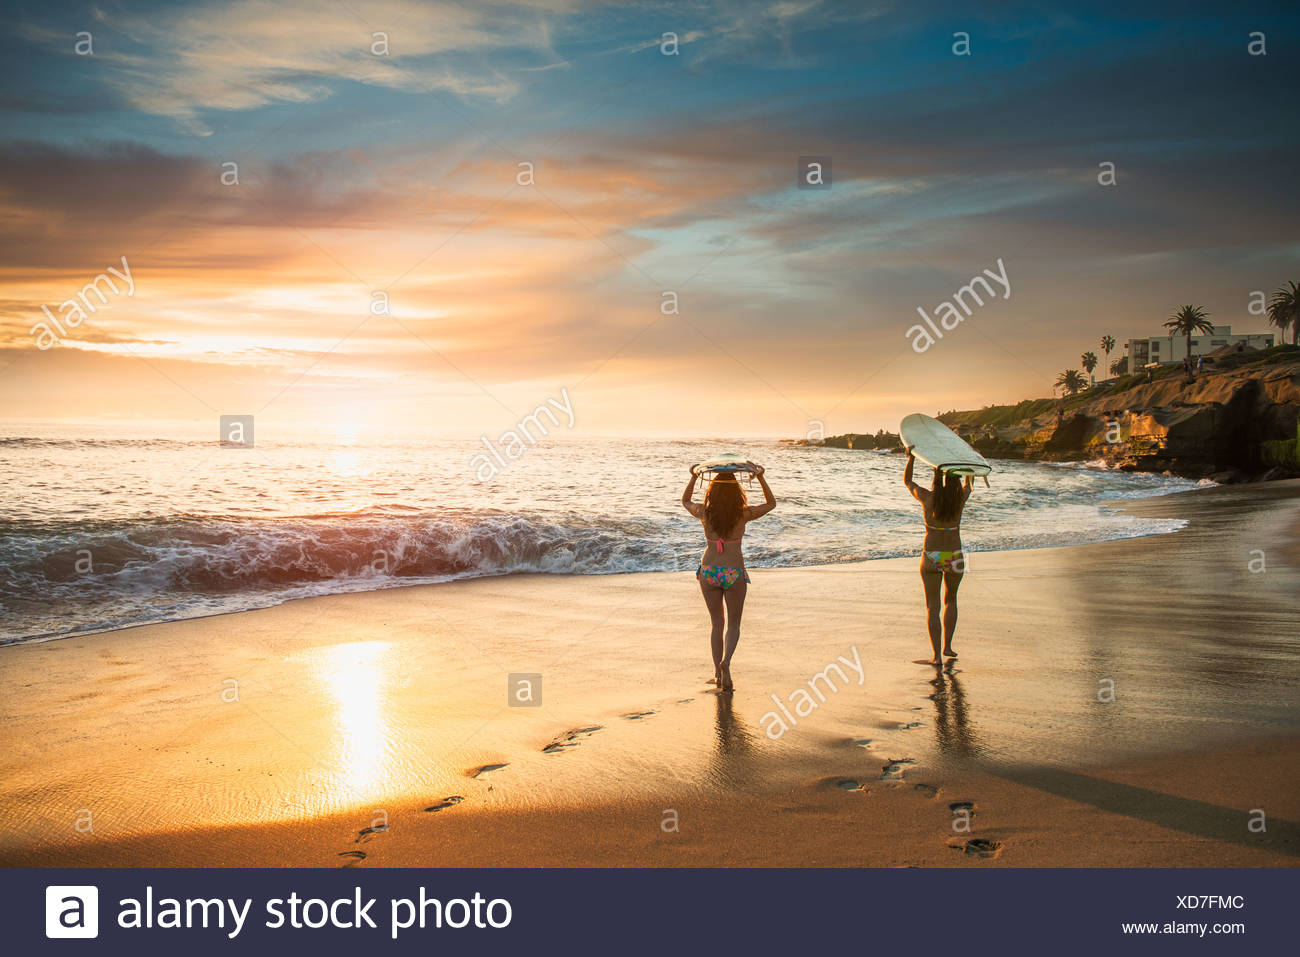 Surfer mit Surfbrett, Strand entlang spazieren Stockbild